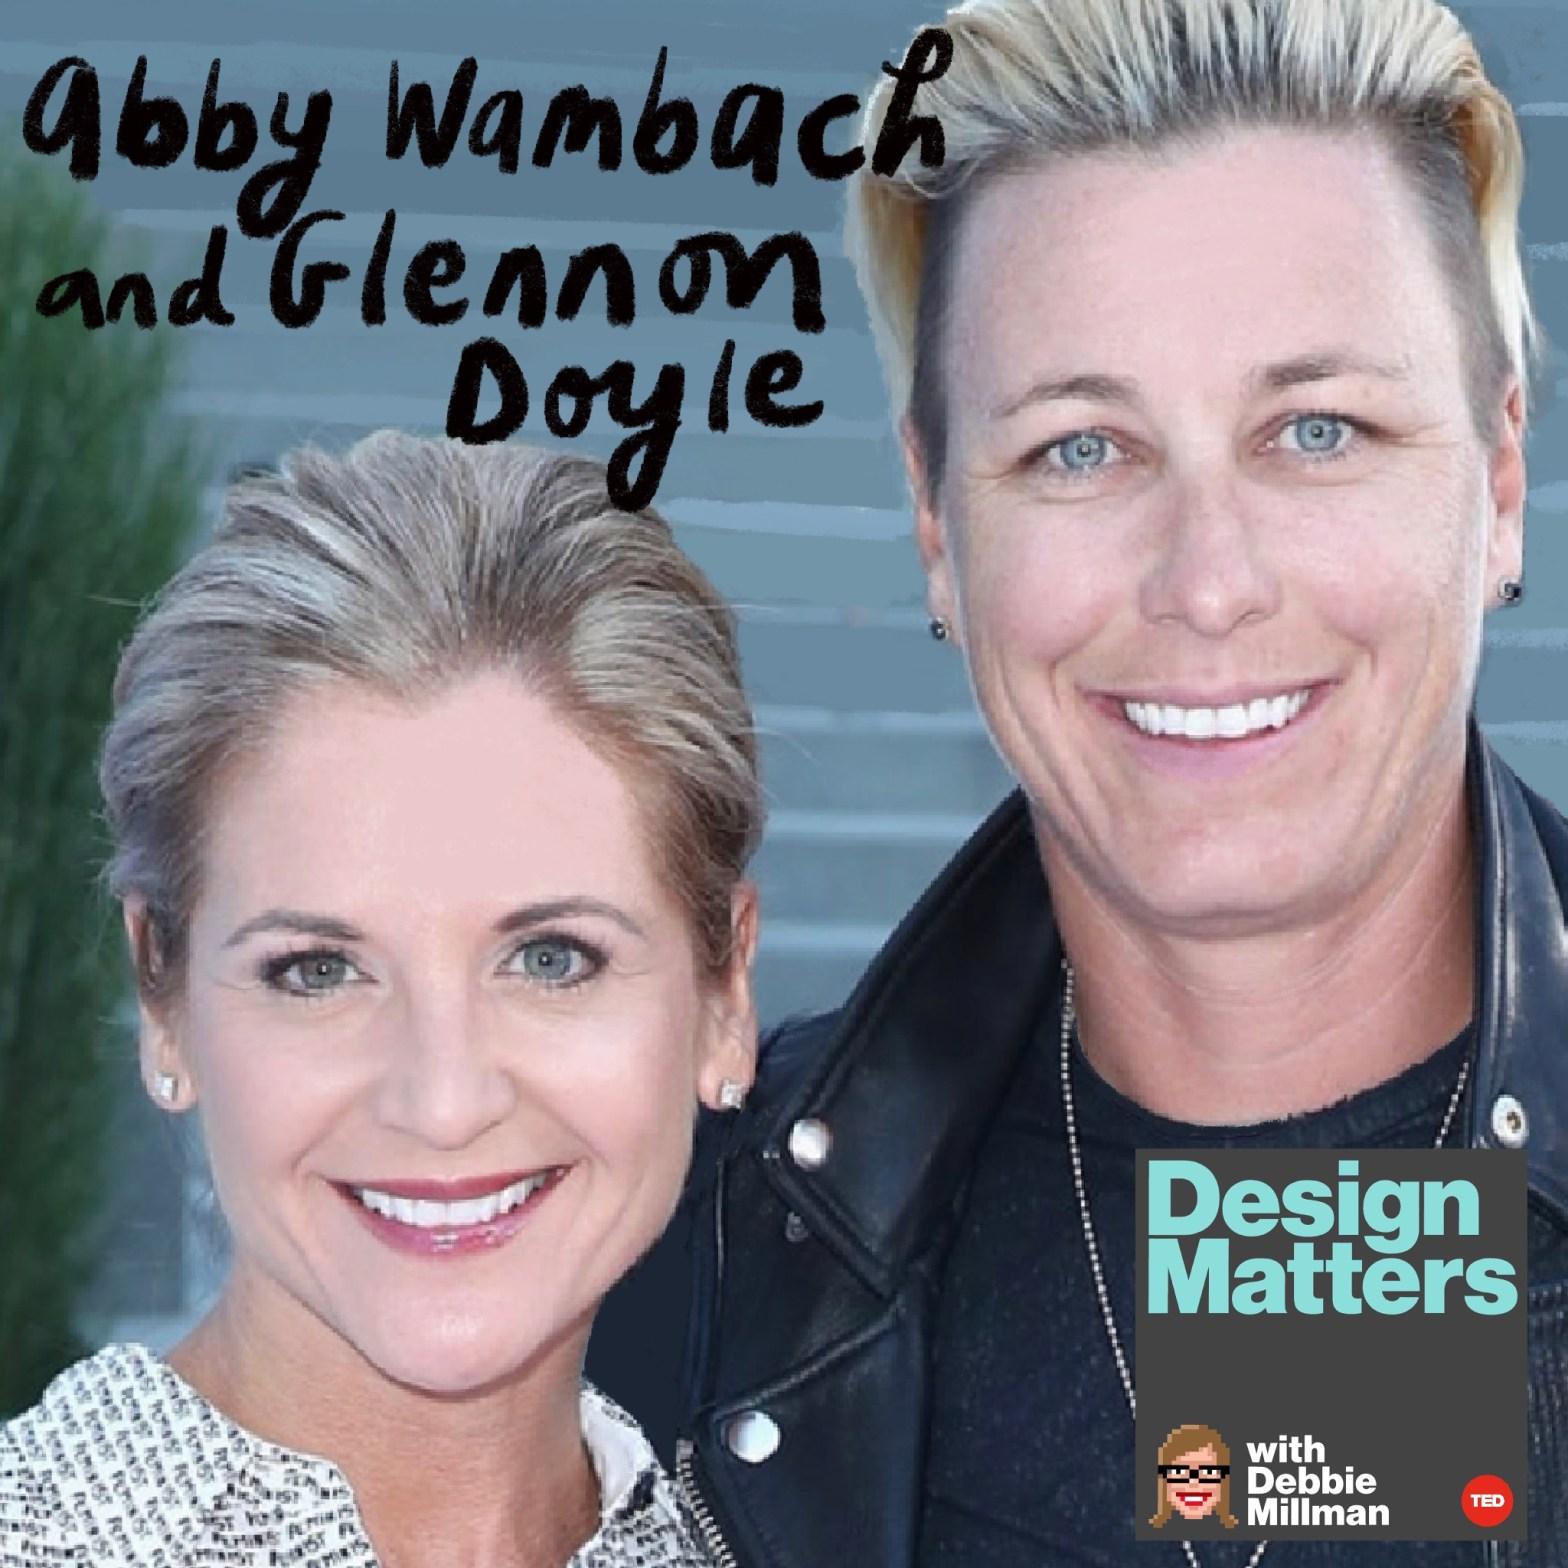 Thumbnail for Glennon Doyle & Abby Wambach